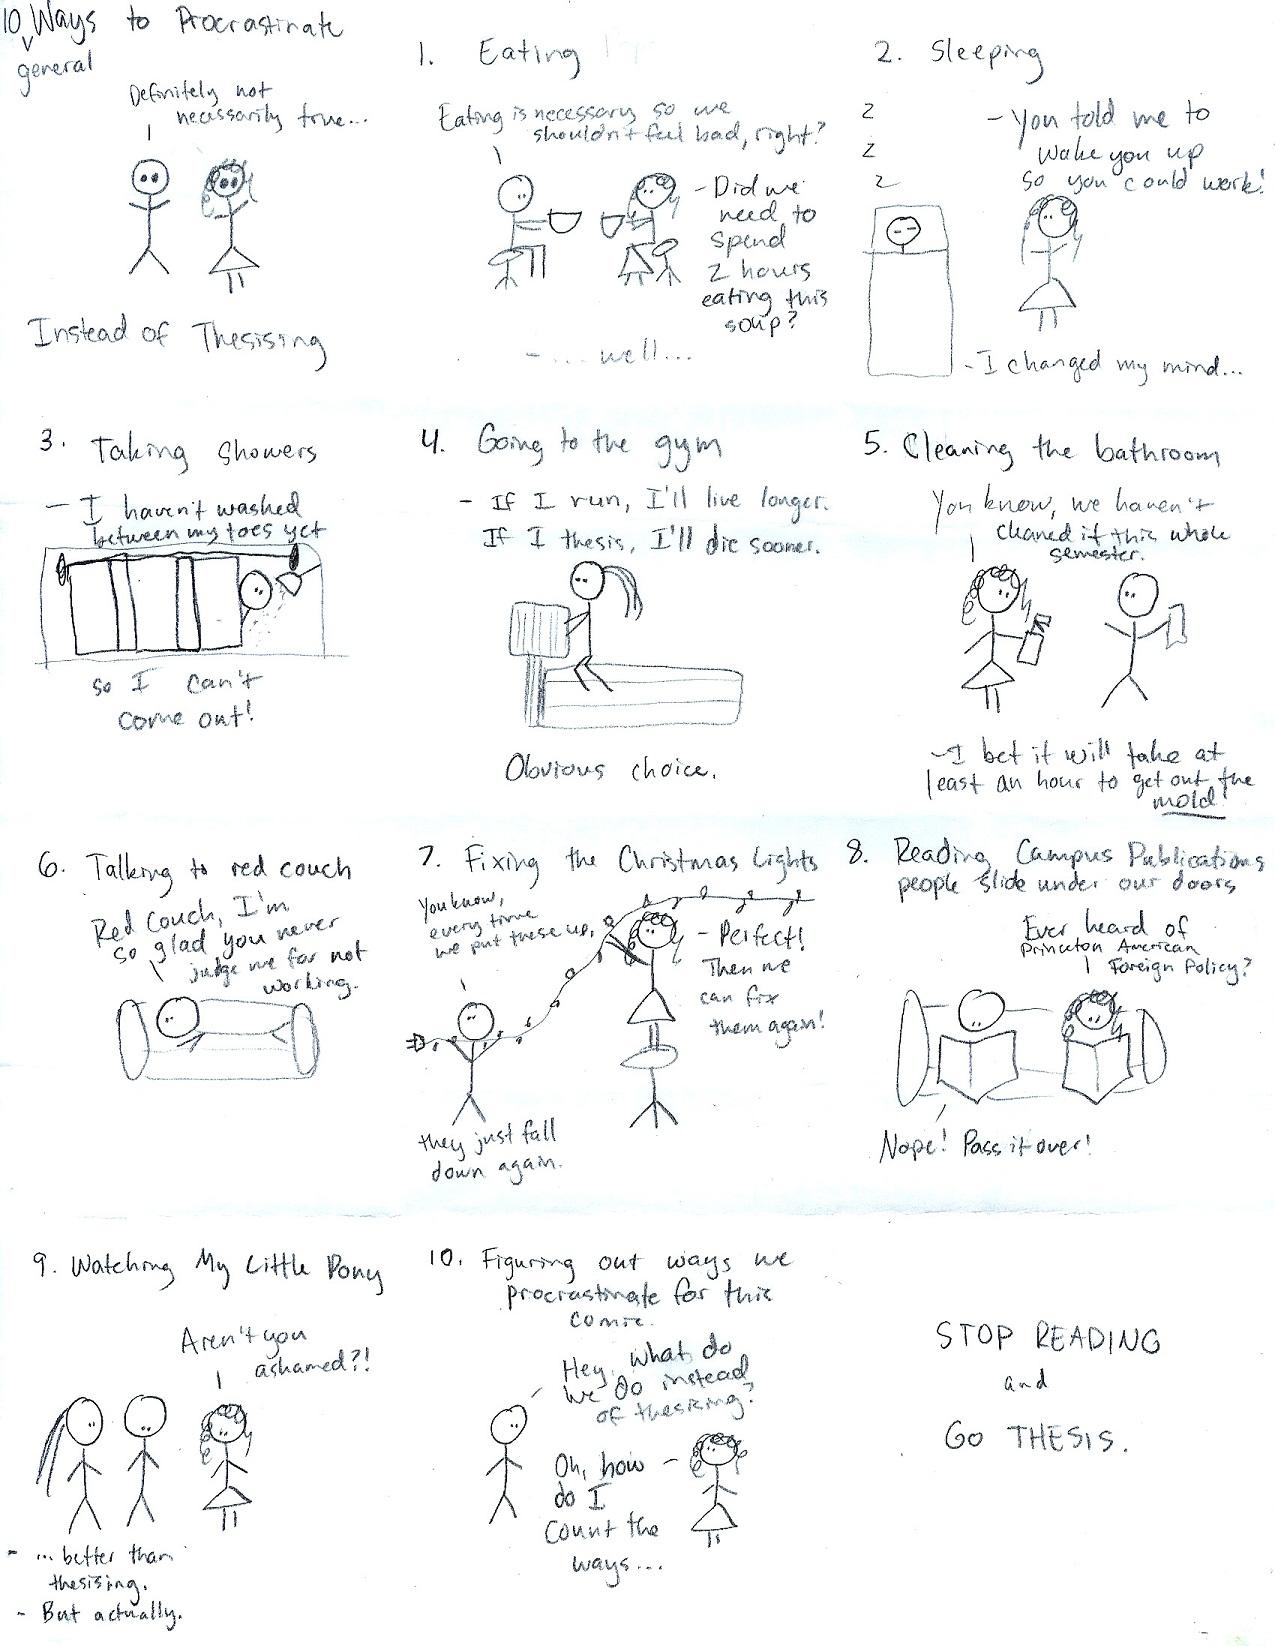 10 Ways to Procrastinate